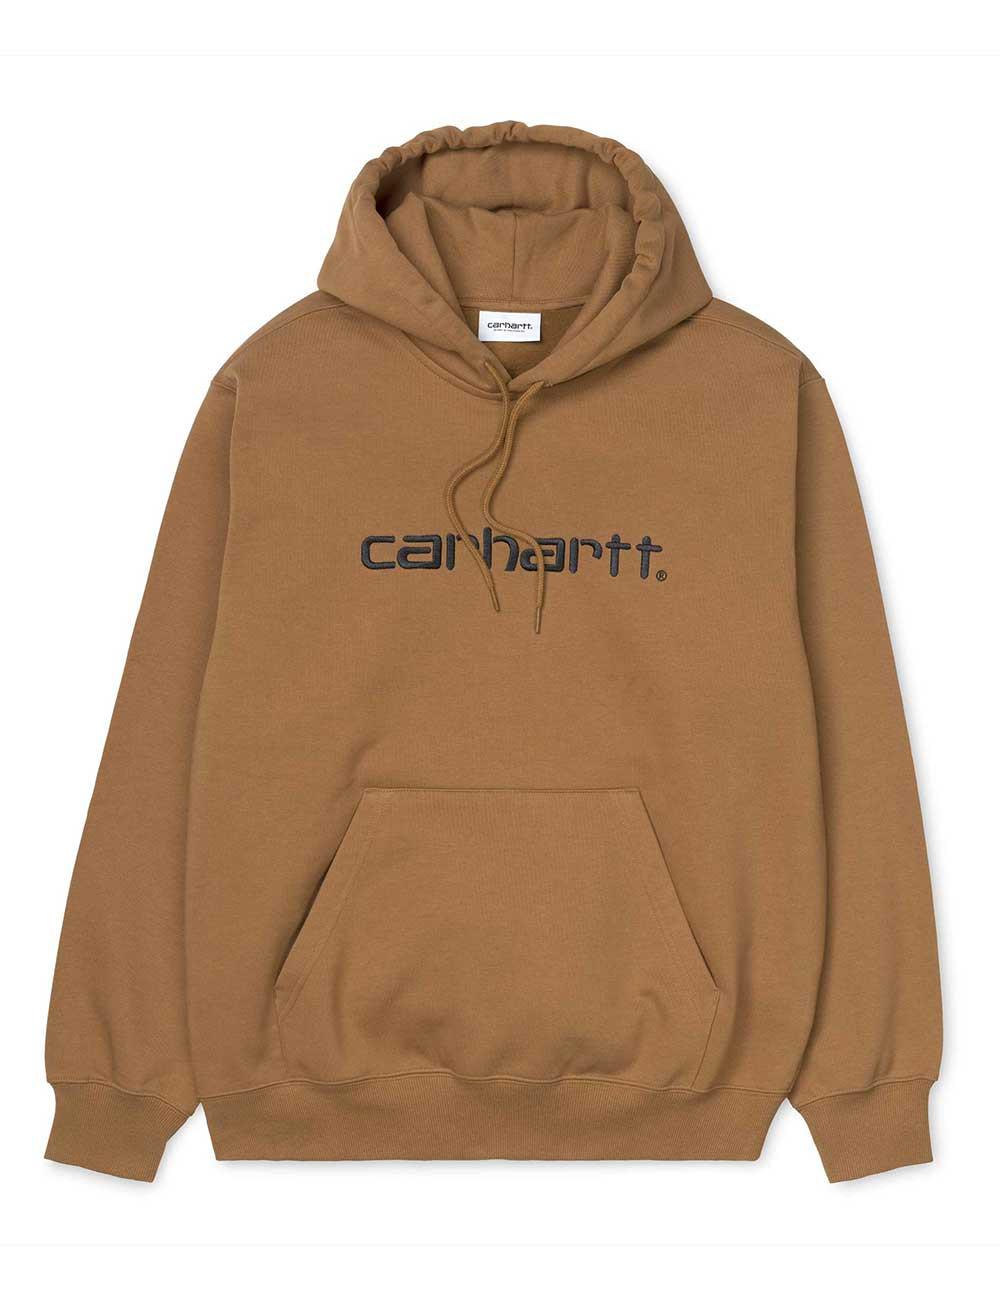 Carhartt Hooded carhartt sweatshirt - I027093   Shapestore.it